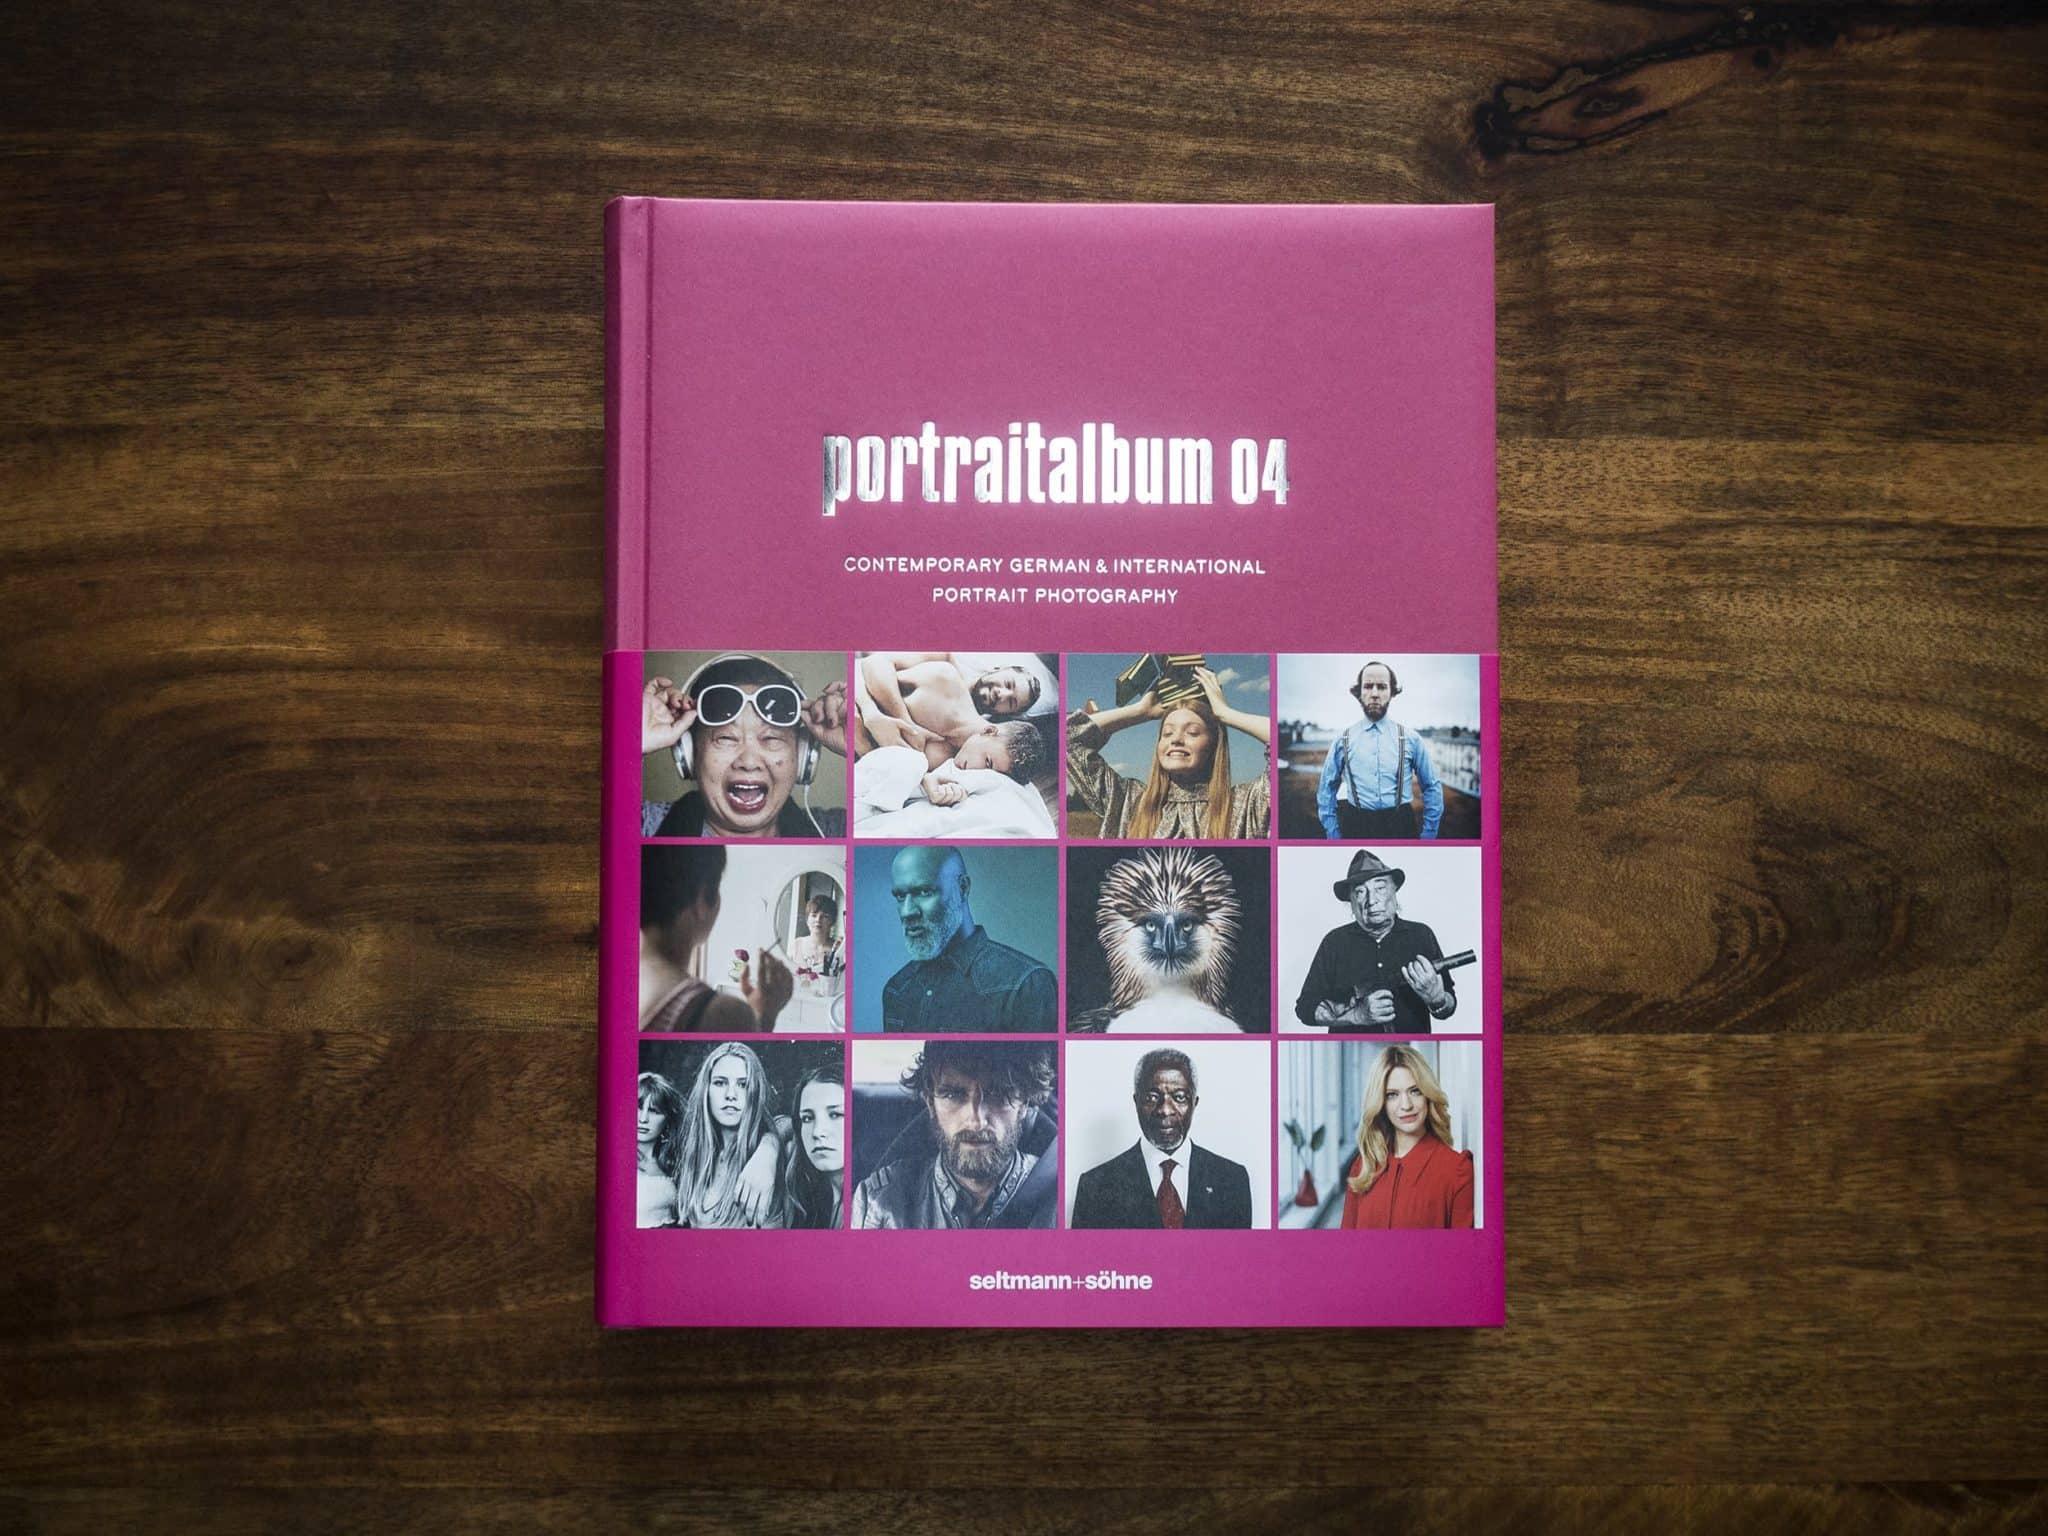 die Alben Portraitalbum 04 Holger Altgeld